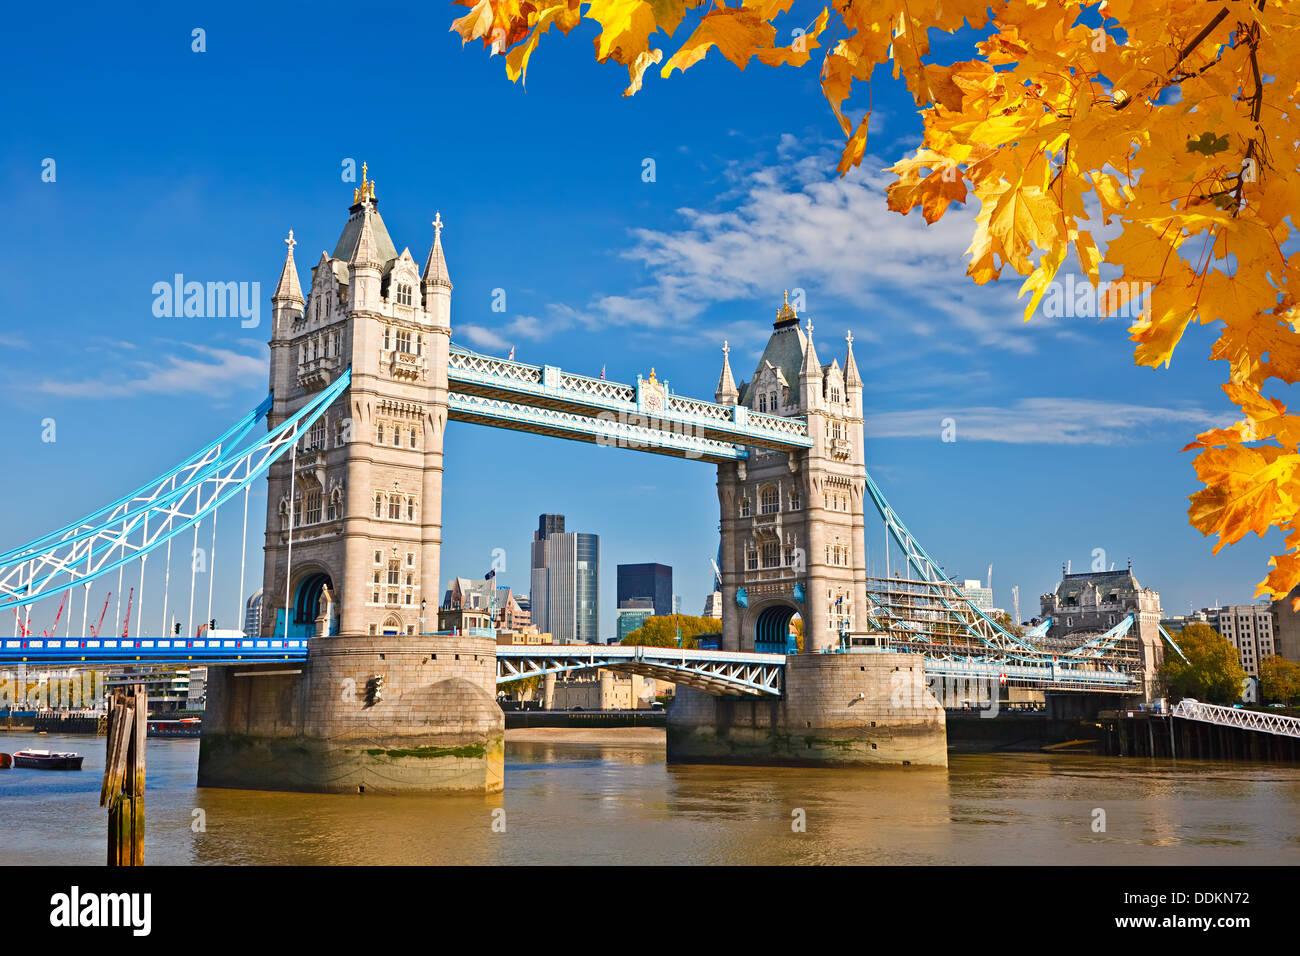 Tower bridge in London - Stock Image